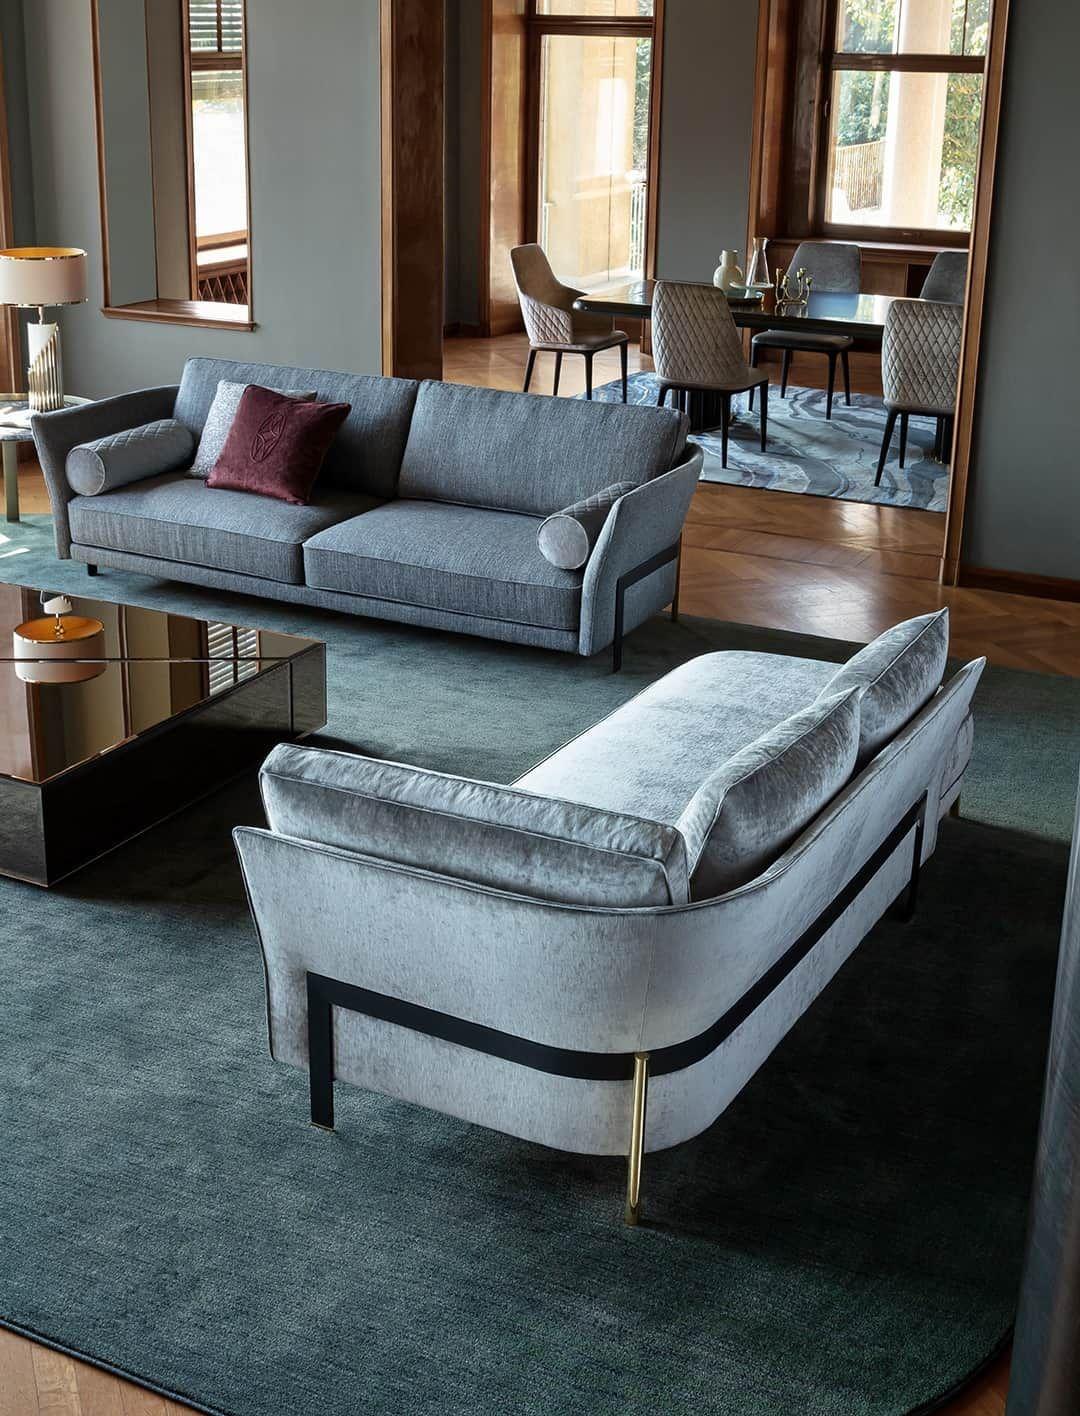 Italian Luxury Furniture Designer Furniture Singapore Da Vinci Lifestyle Luxurious Bedrooms Furniture Contemporary Furniture Design